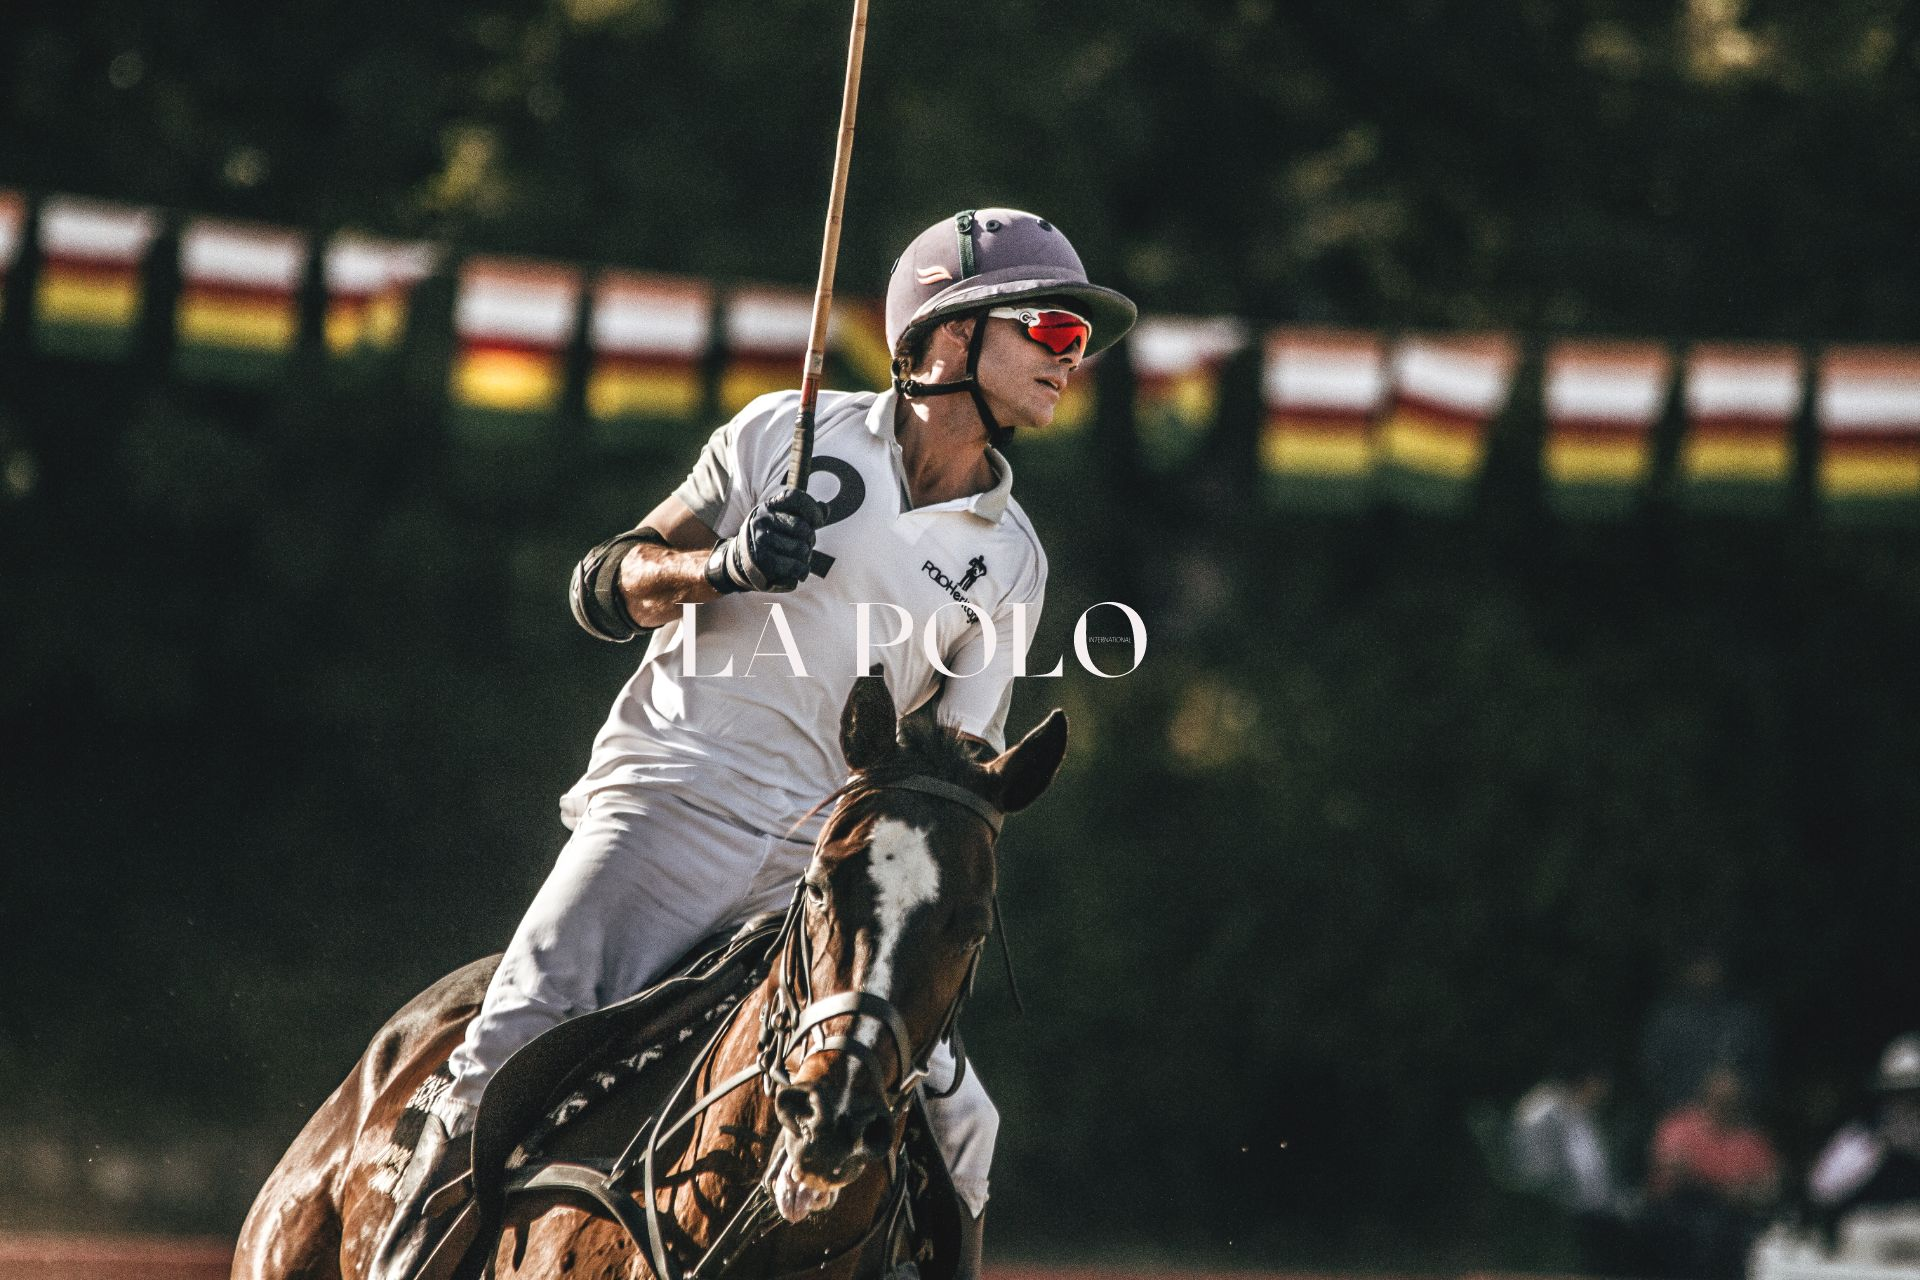 """Polo Is Family, Lifestyle and Dedication""~ Emilio Urrea Kirby"